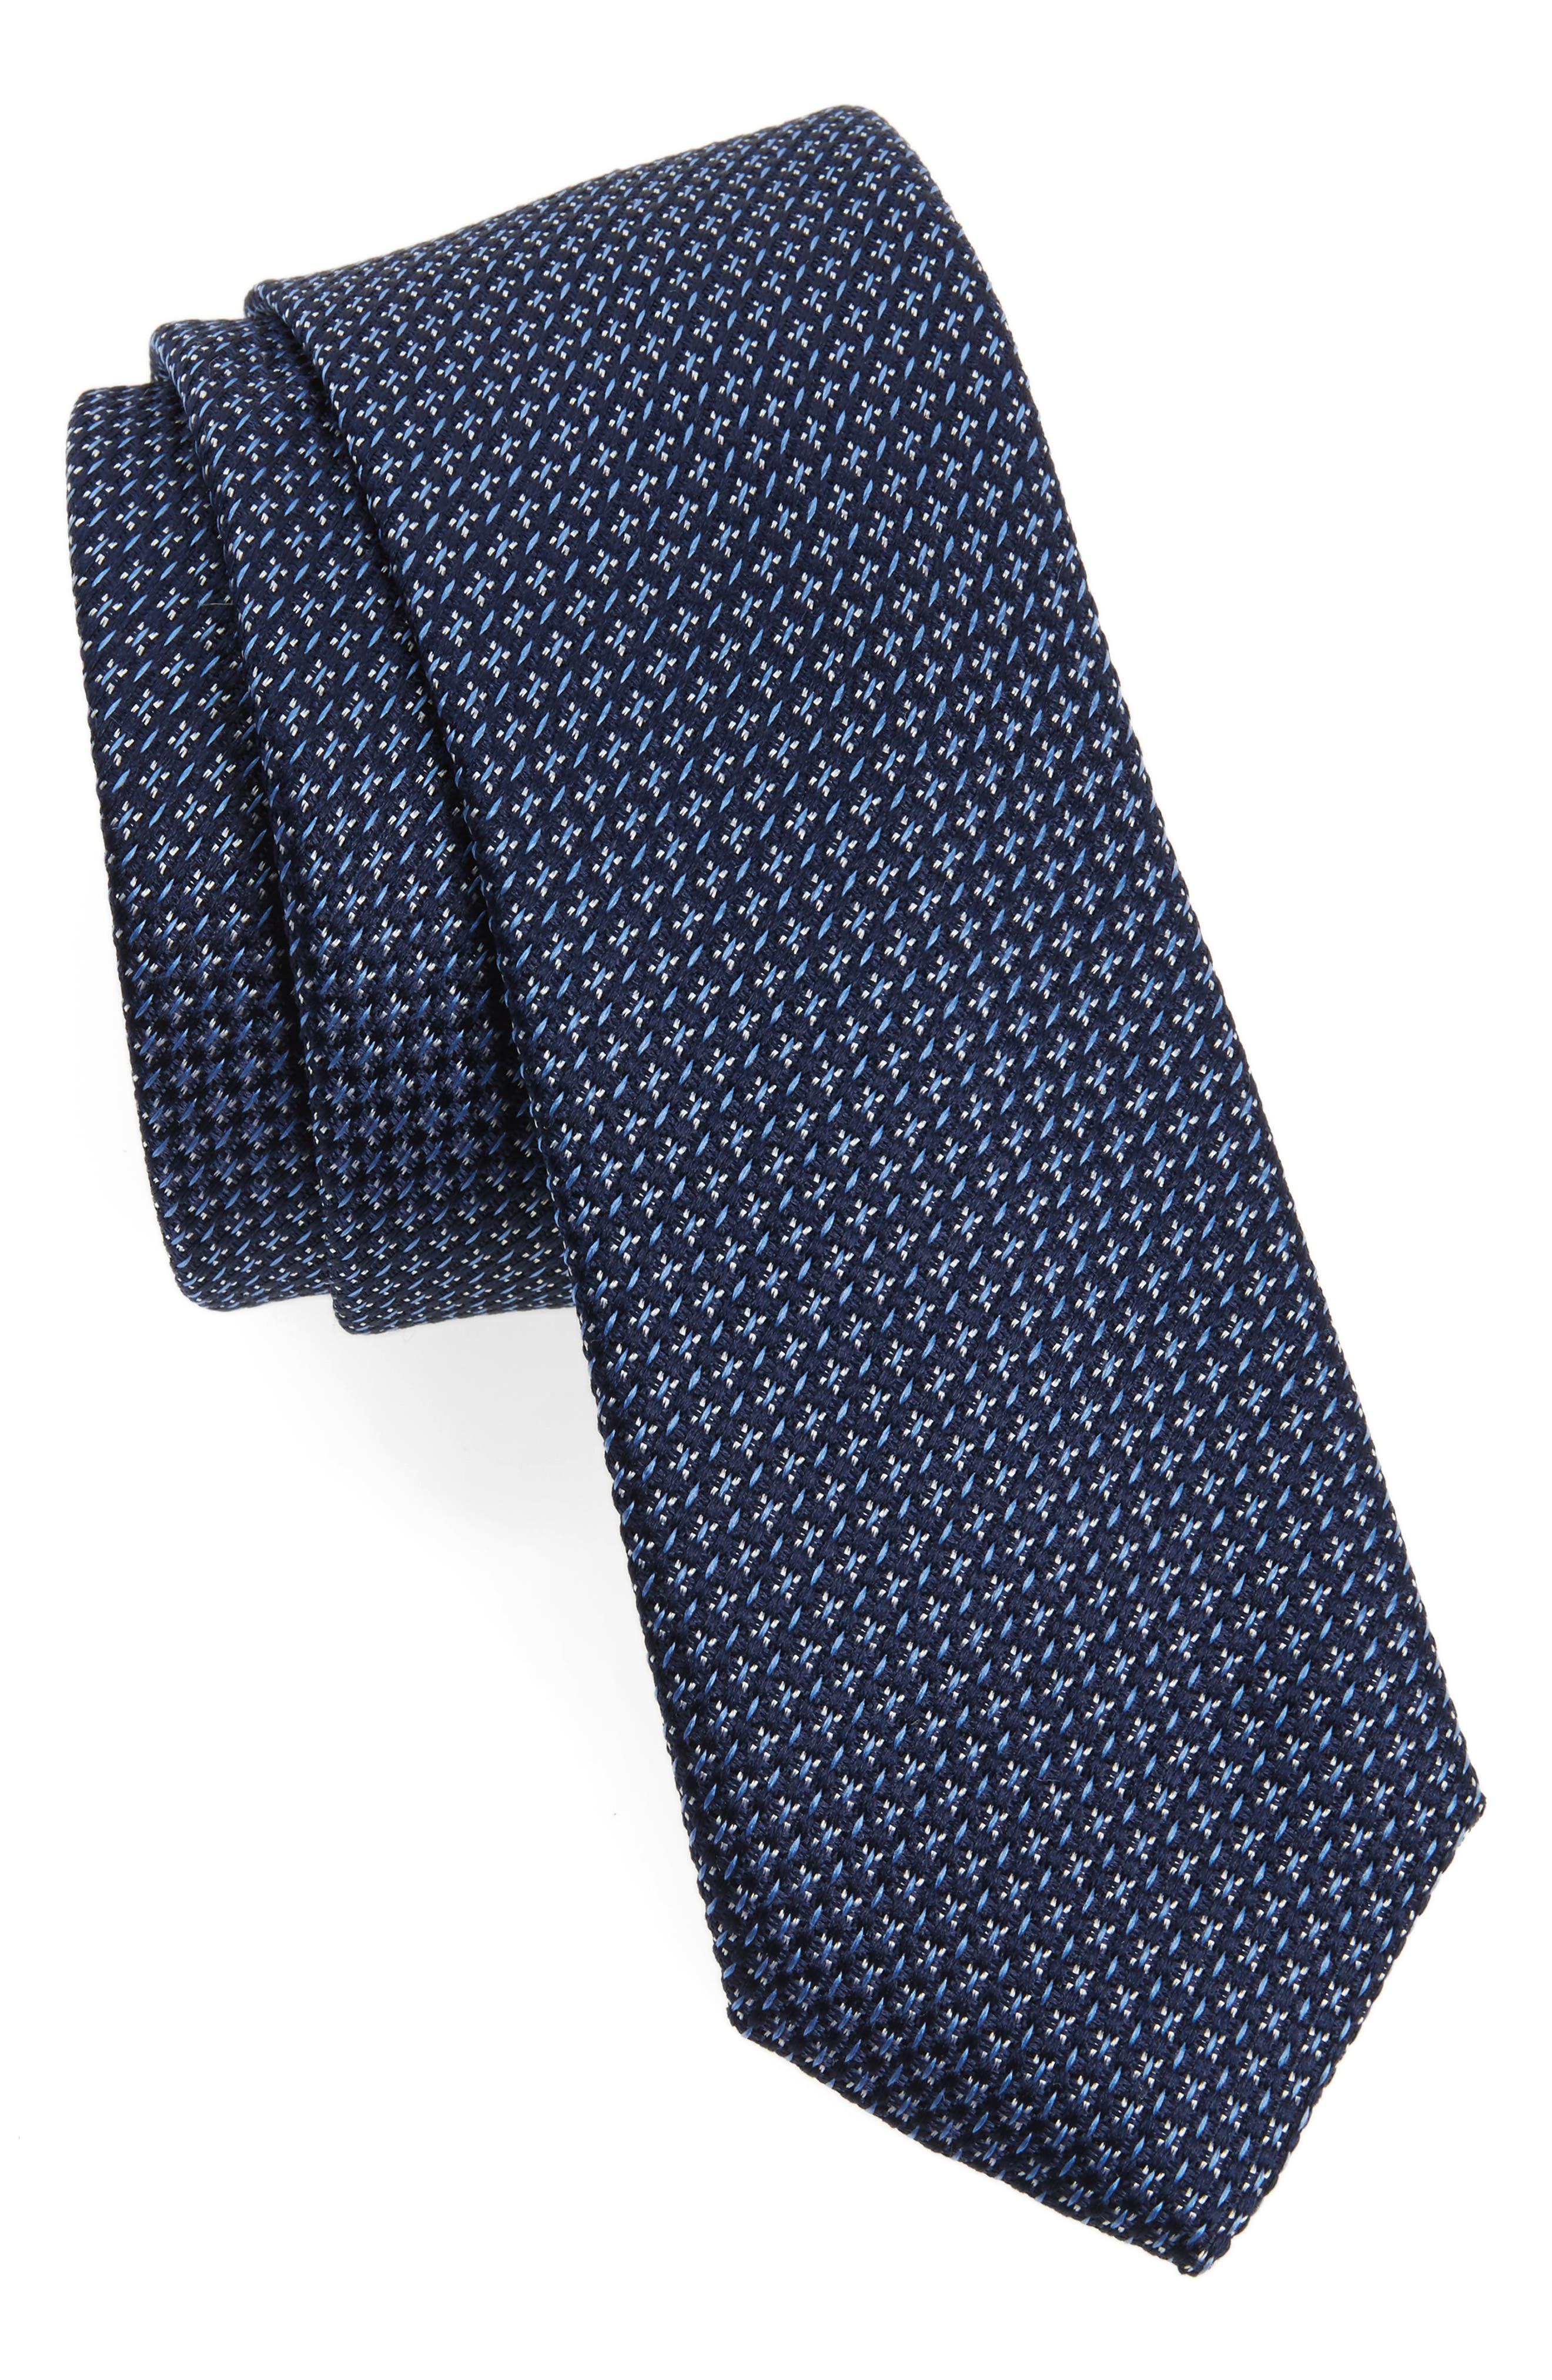 Knitex Solid Silk Tie,                             Main thumbnail 1, color,                             Navy